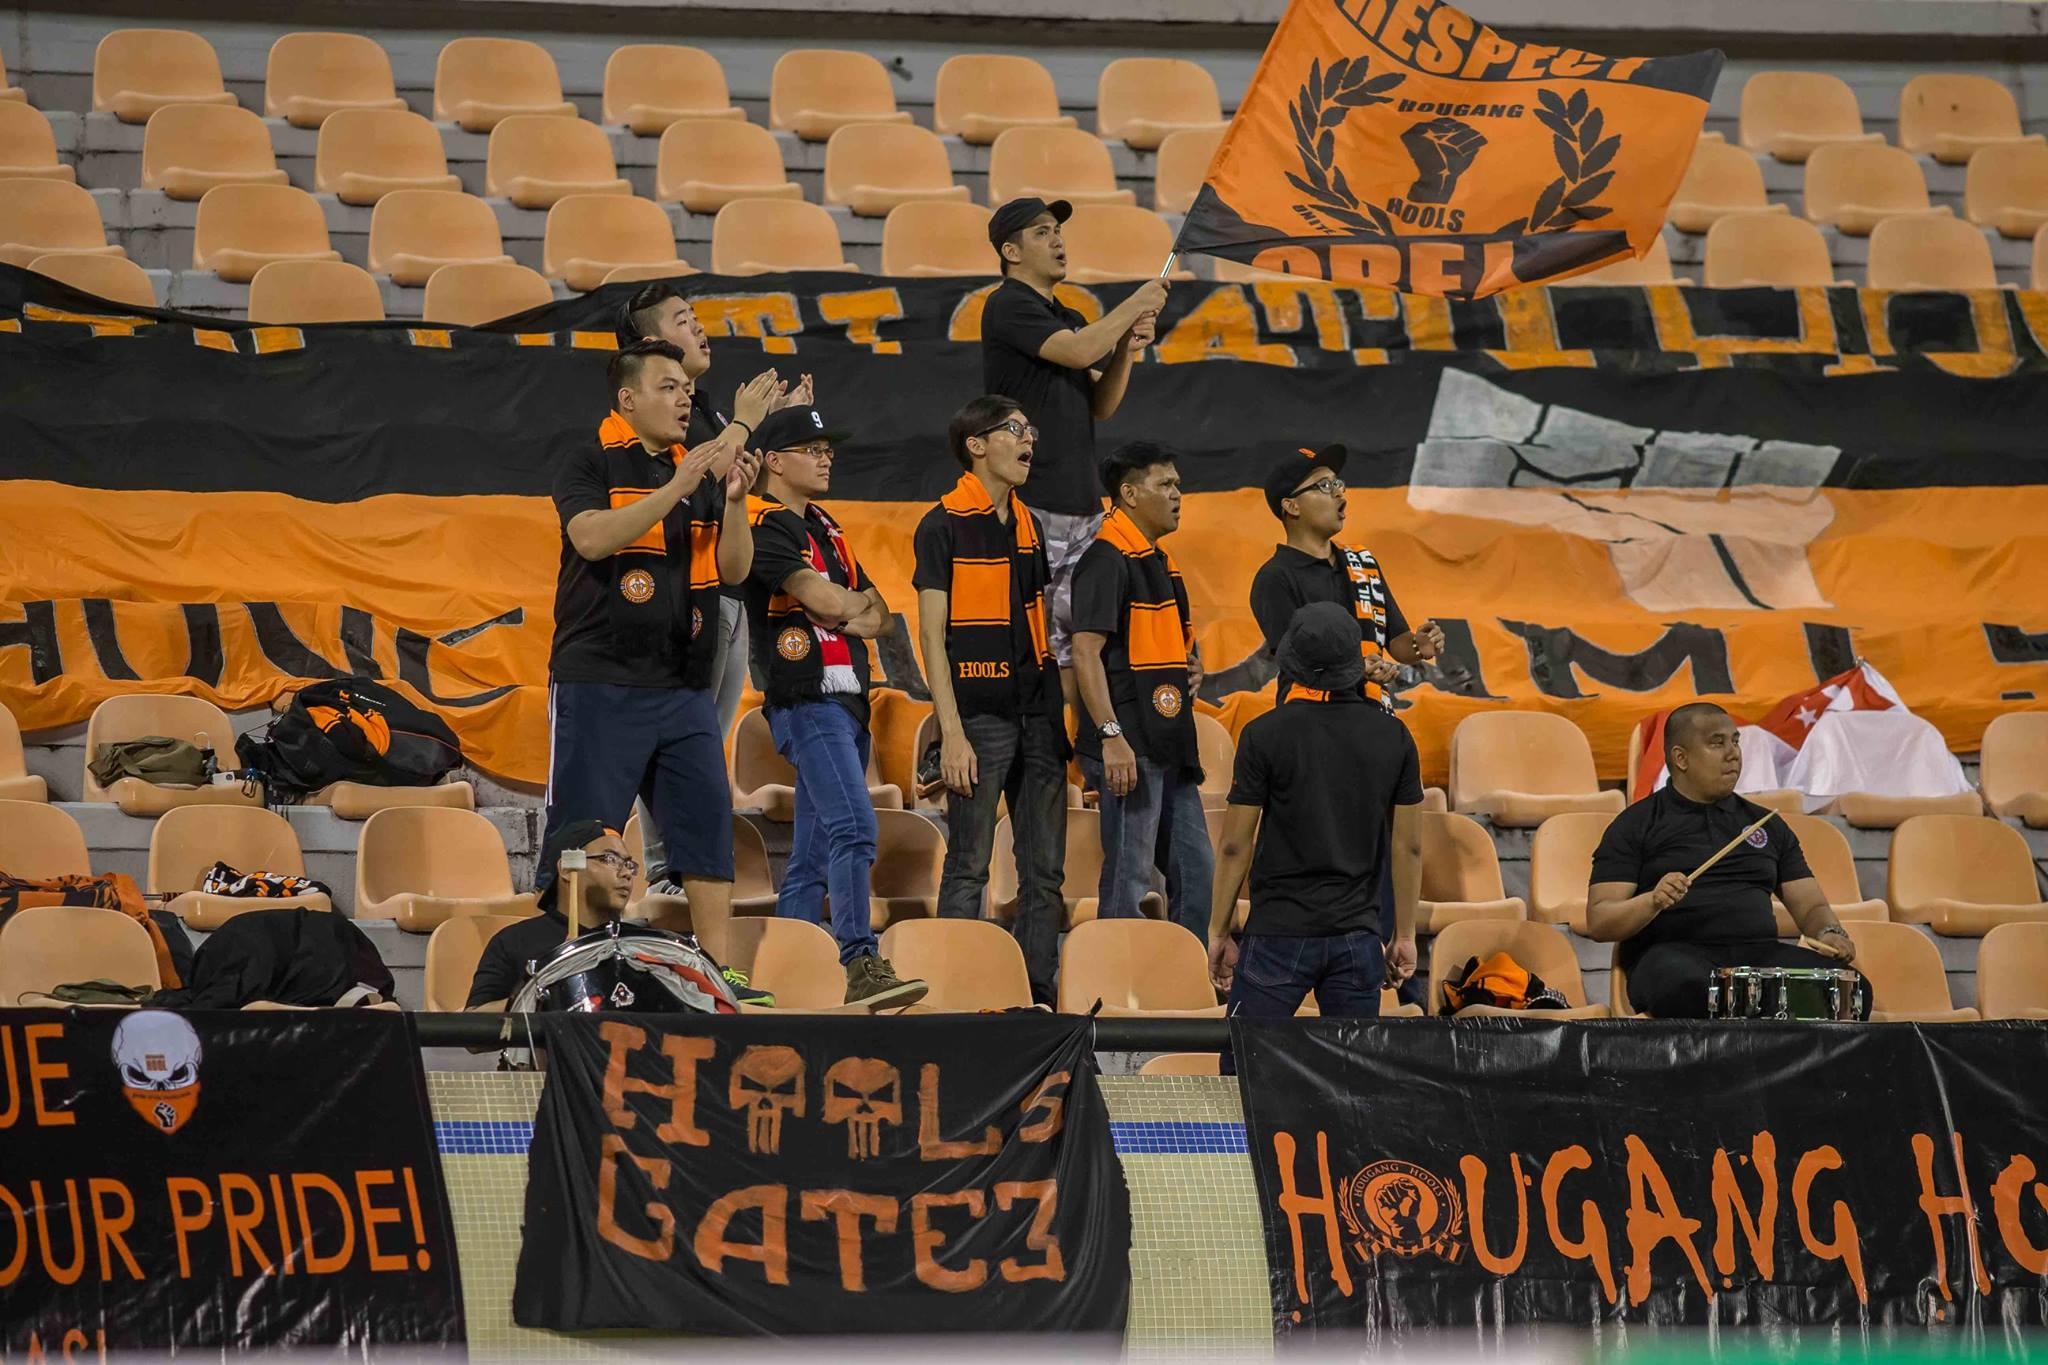 Hougang Hools making their presence felt at the Hassanal Bolkiah stadium.